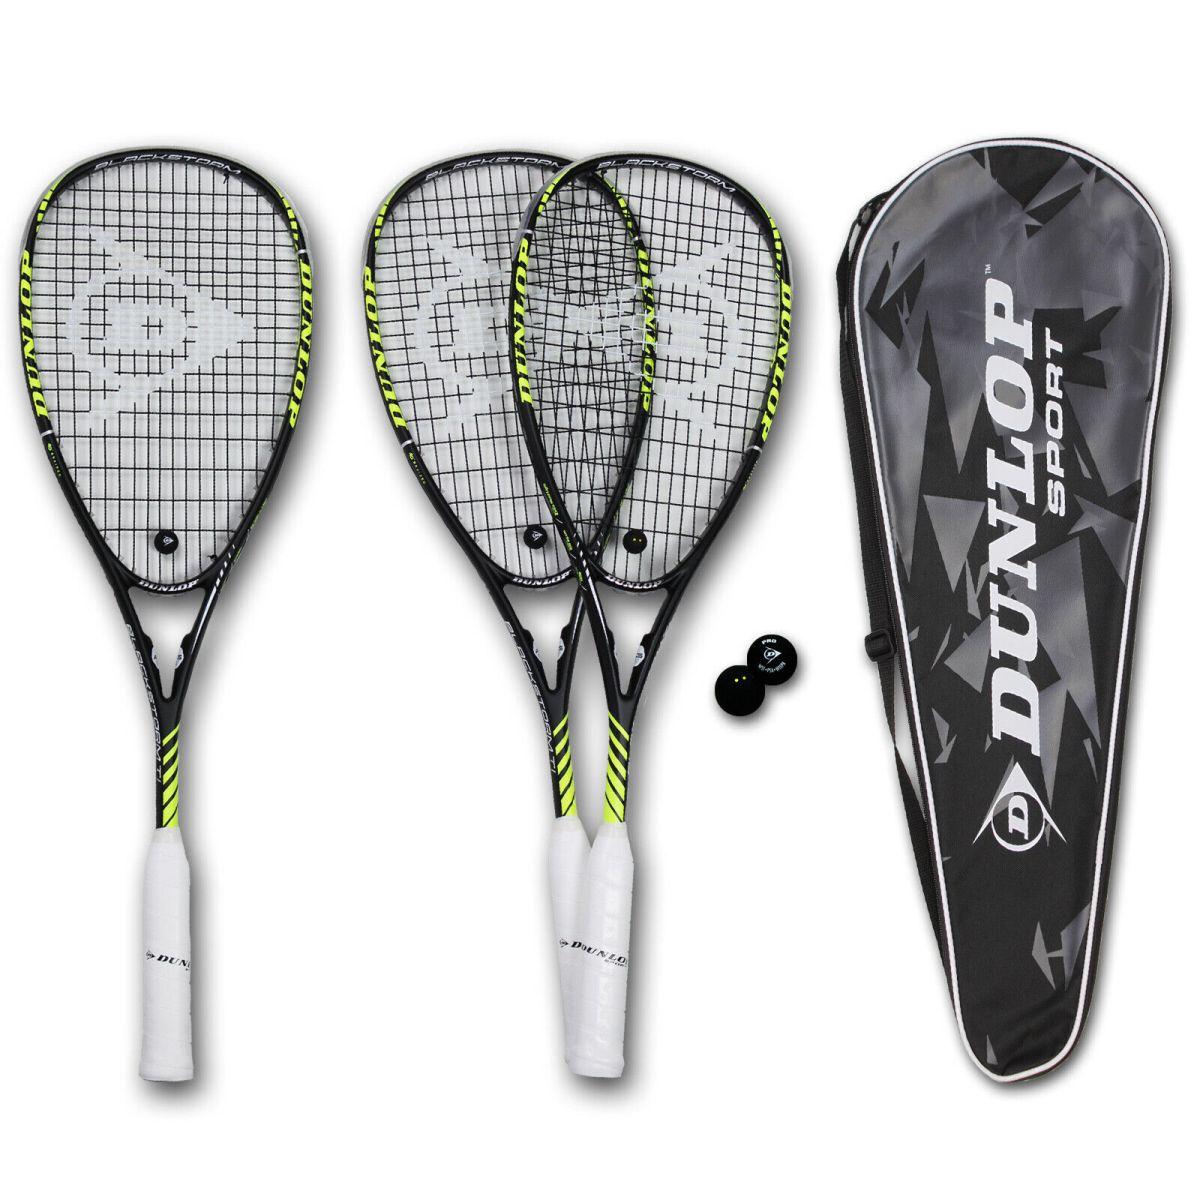 DUNLOP Blackstorm Ti Squashschläger Squashset Ball 2 Punkte Tasche 4 Varianten